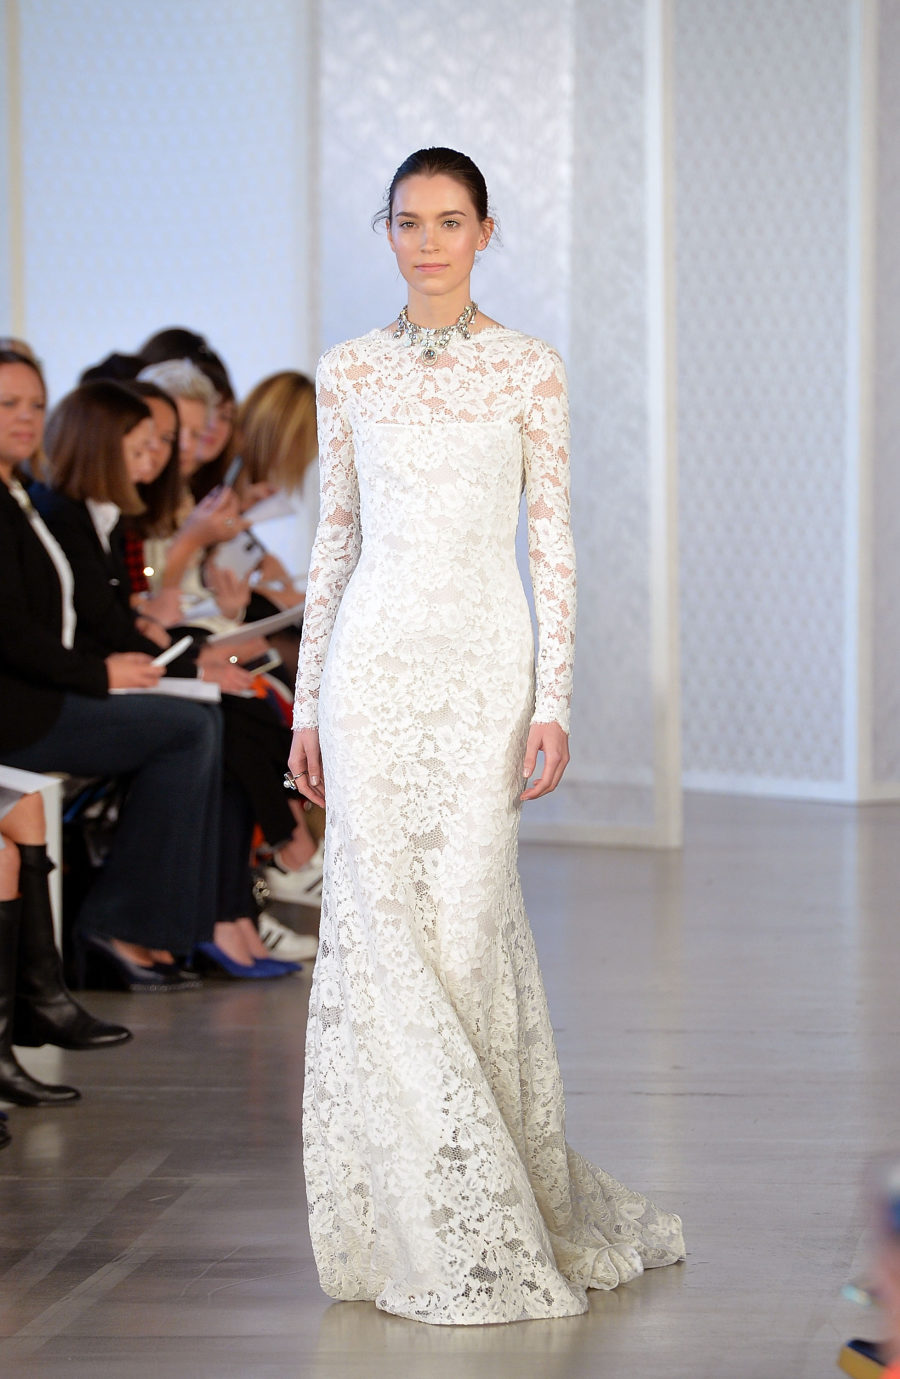 Ruffle Wedding Dress 76 Fabulous